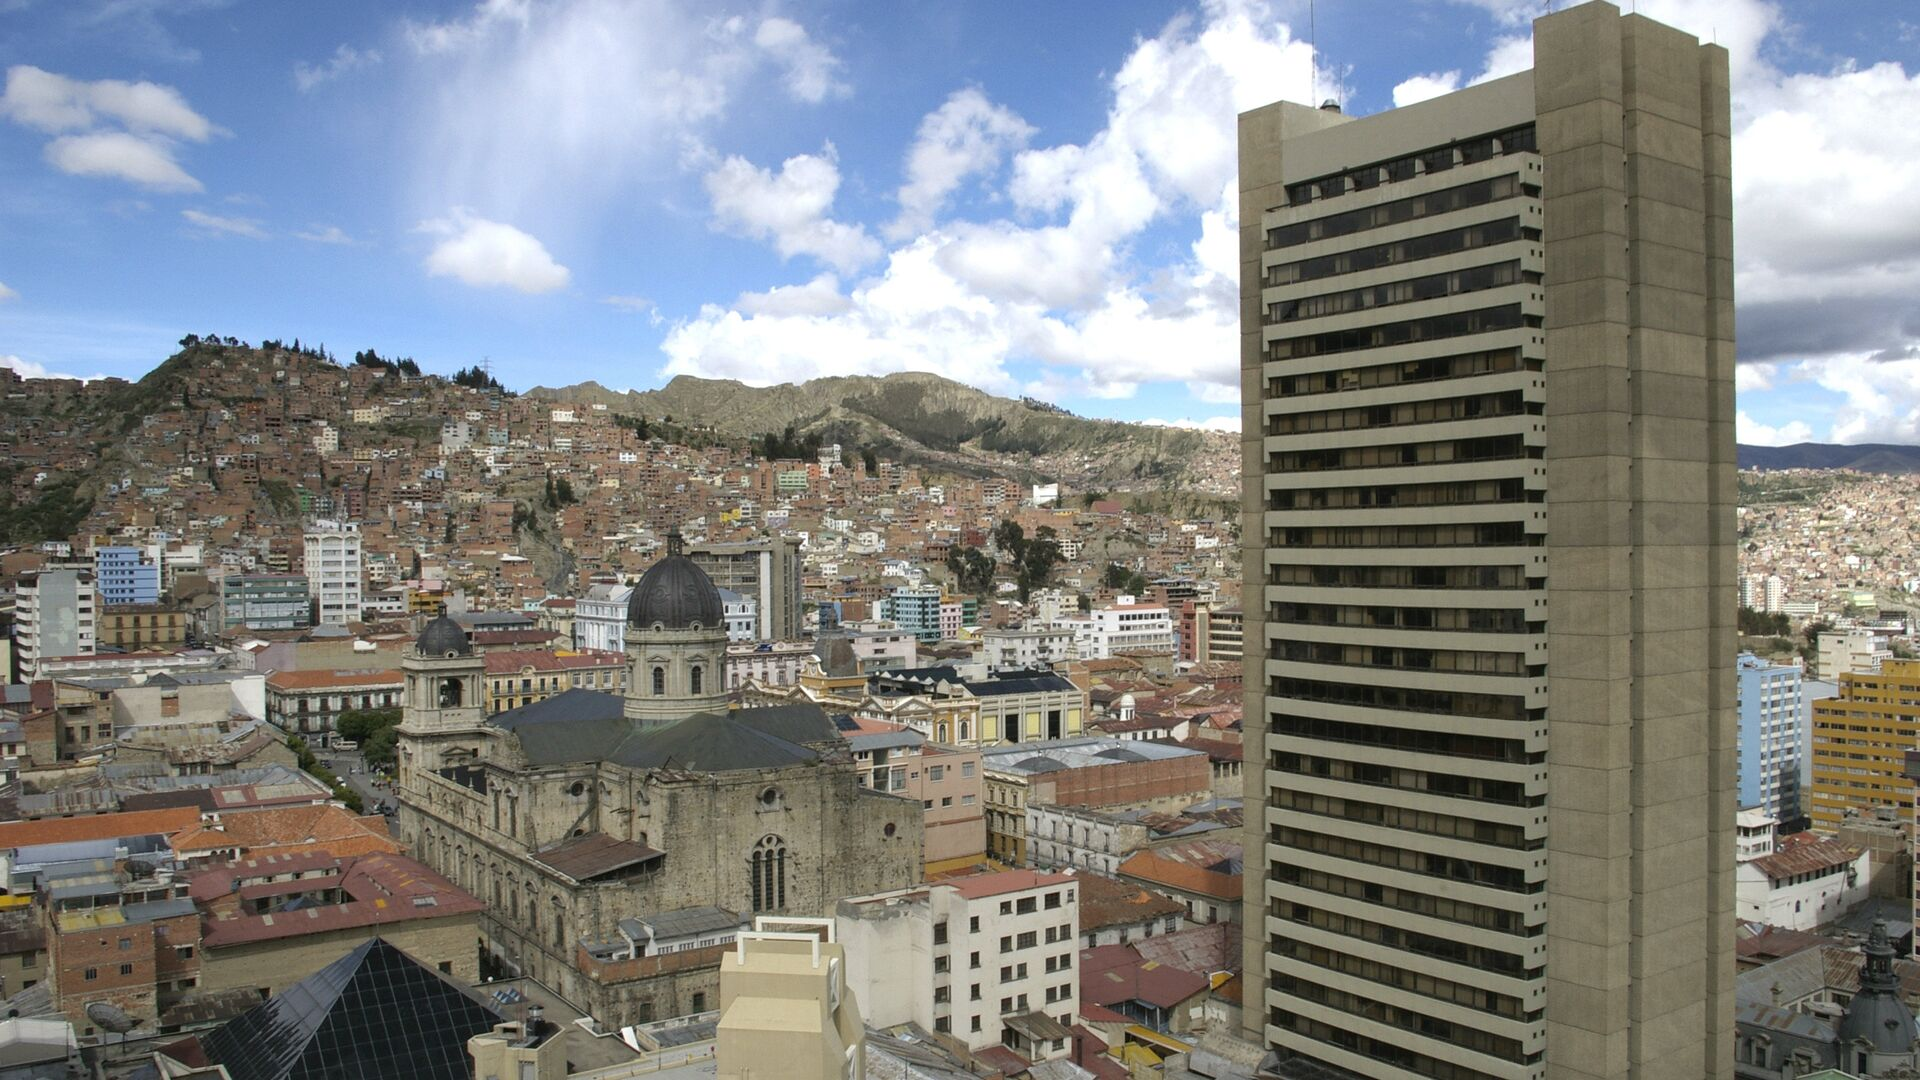 La Paz, la capital de Bolivia - Sputnik Mundo, 1920, 26.05.2021